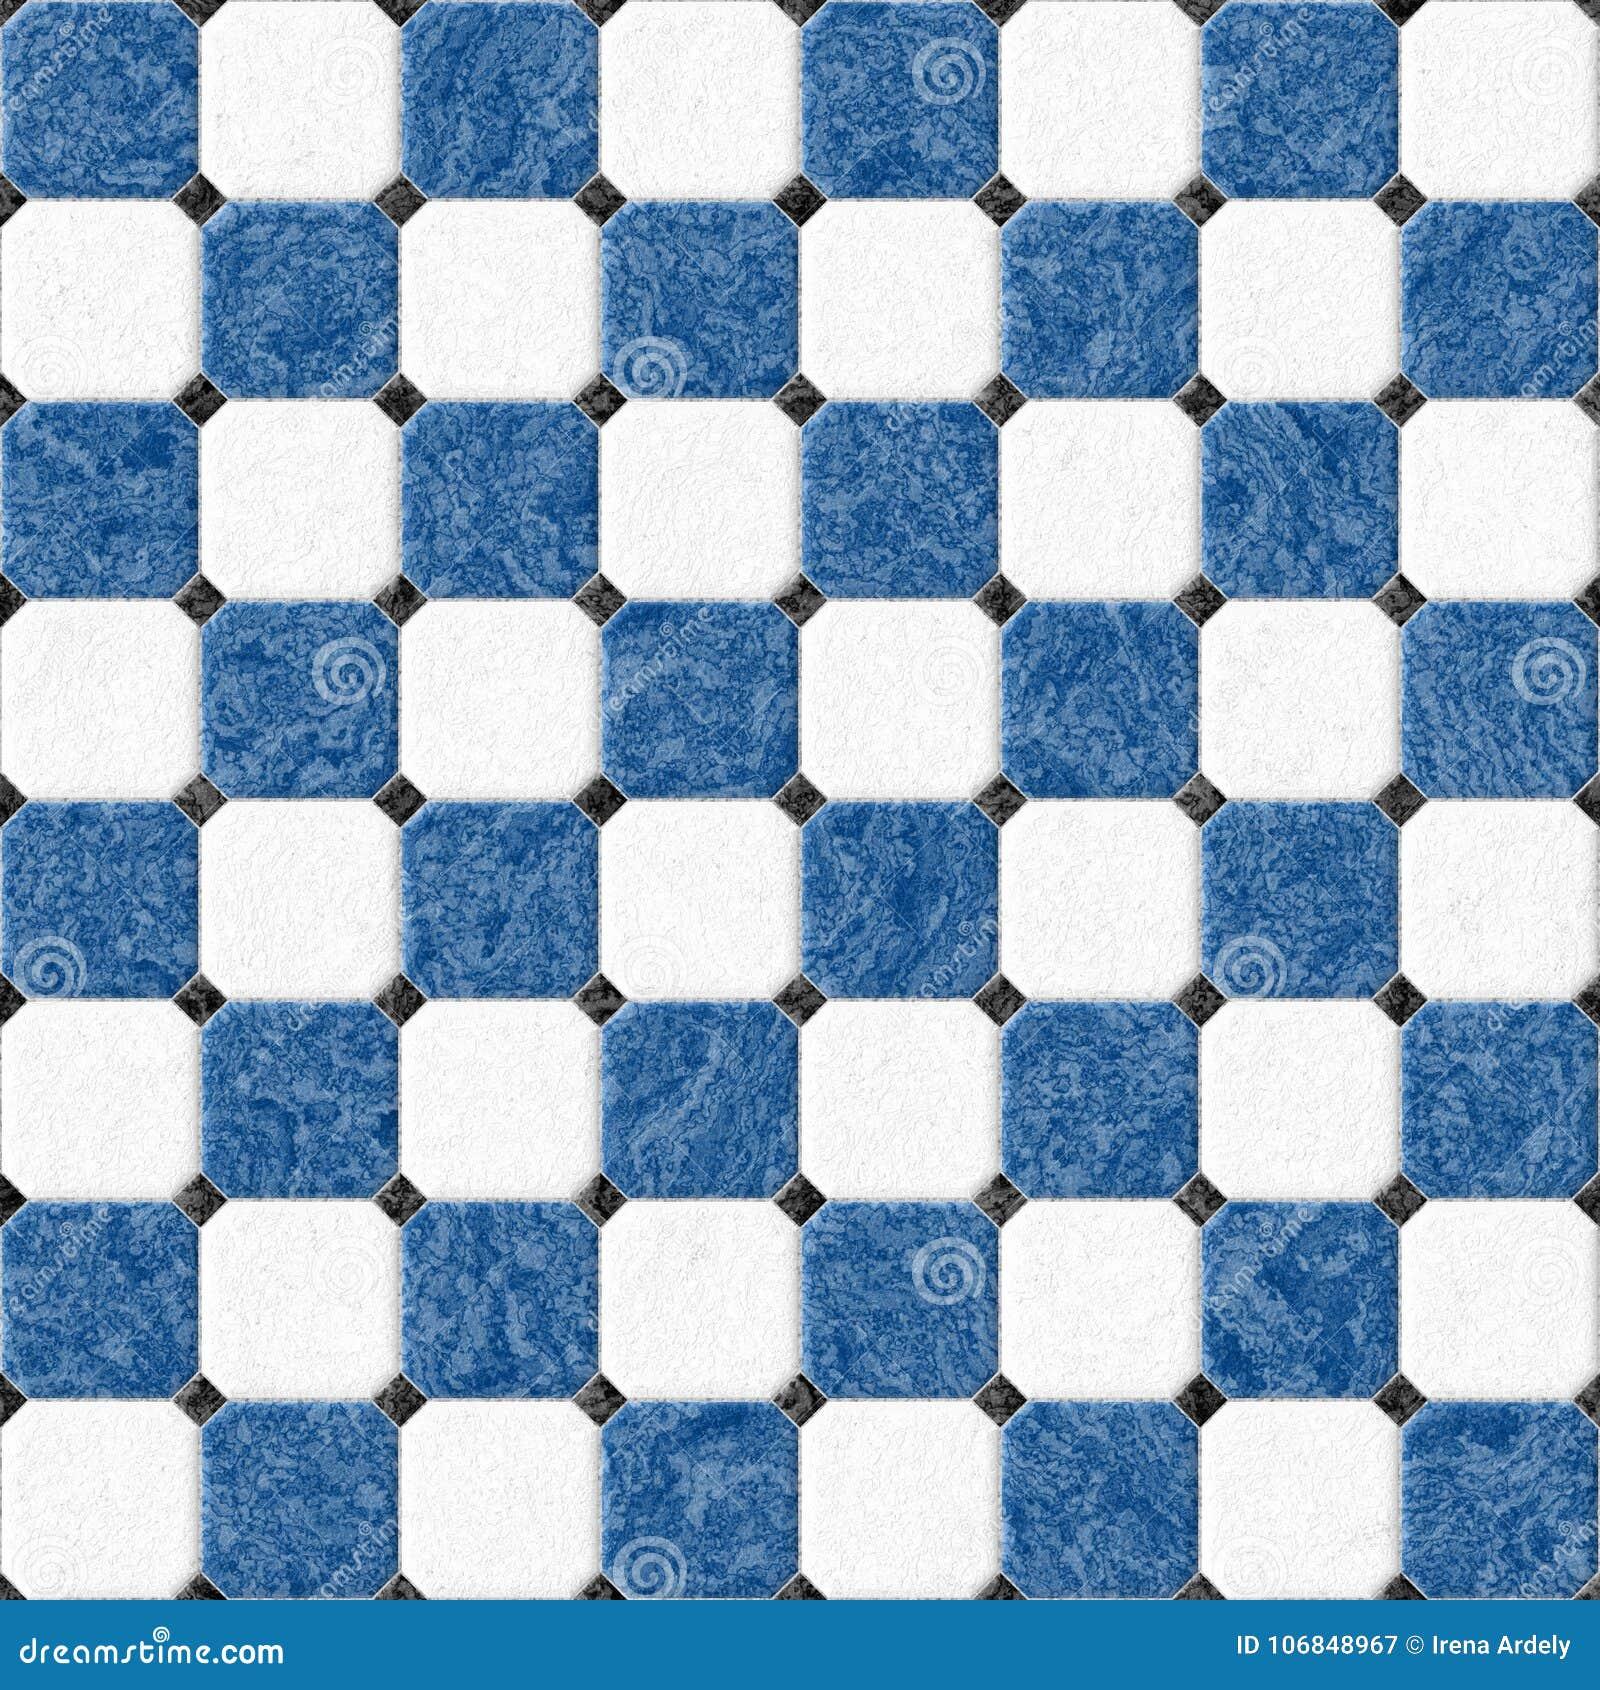 Marble Floor Tiles With Black Rhombs Seamless Pattern Texture ...